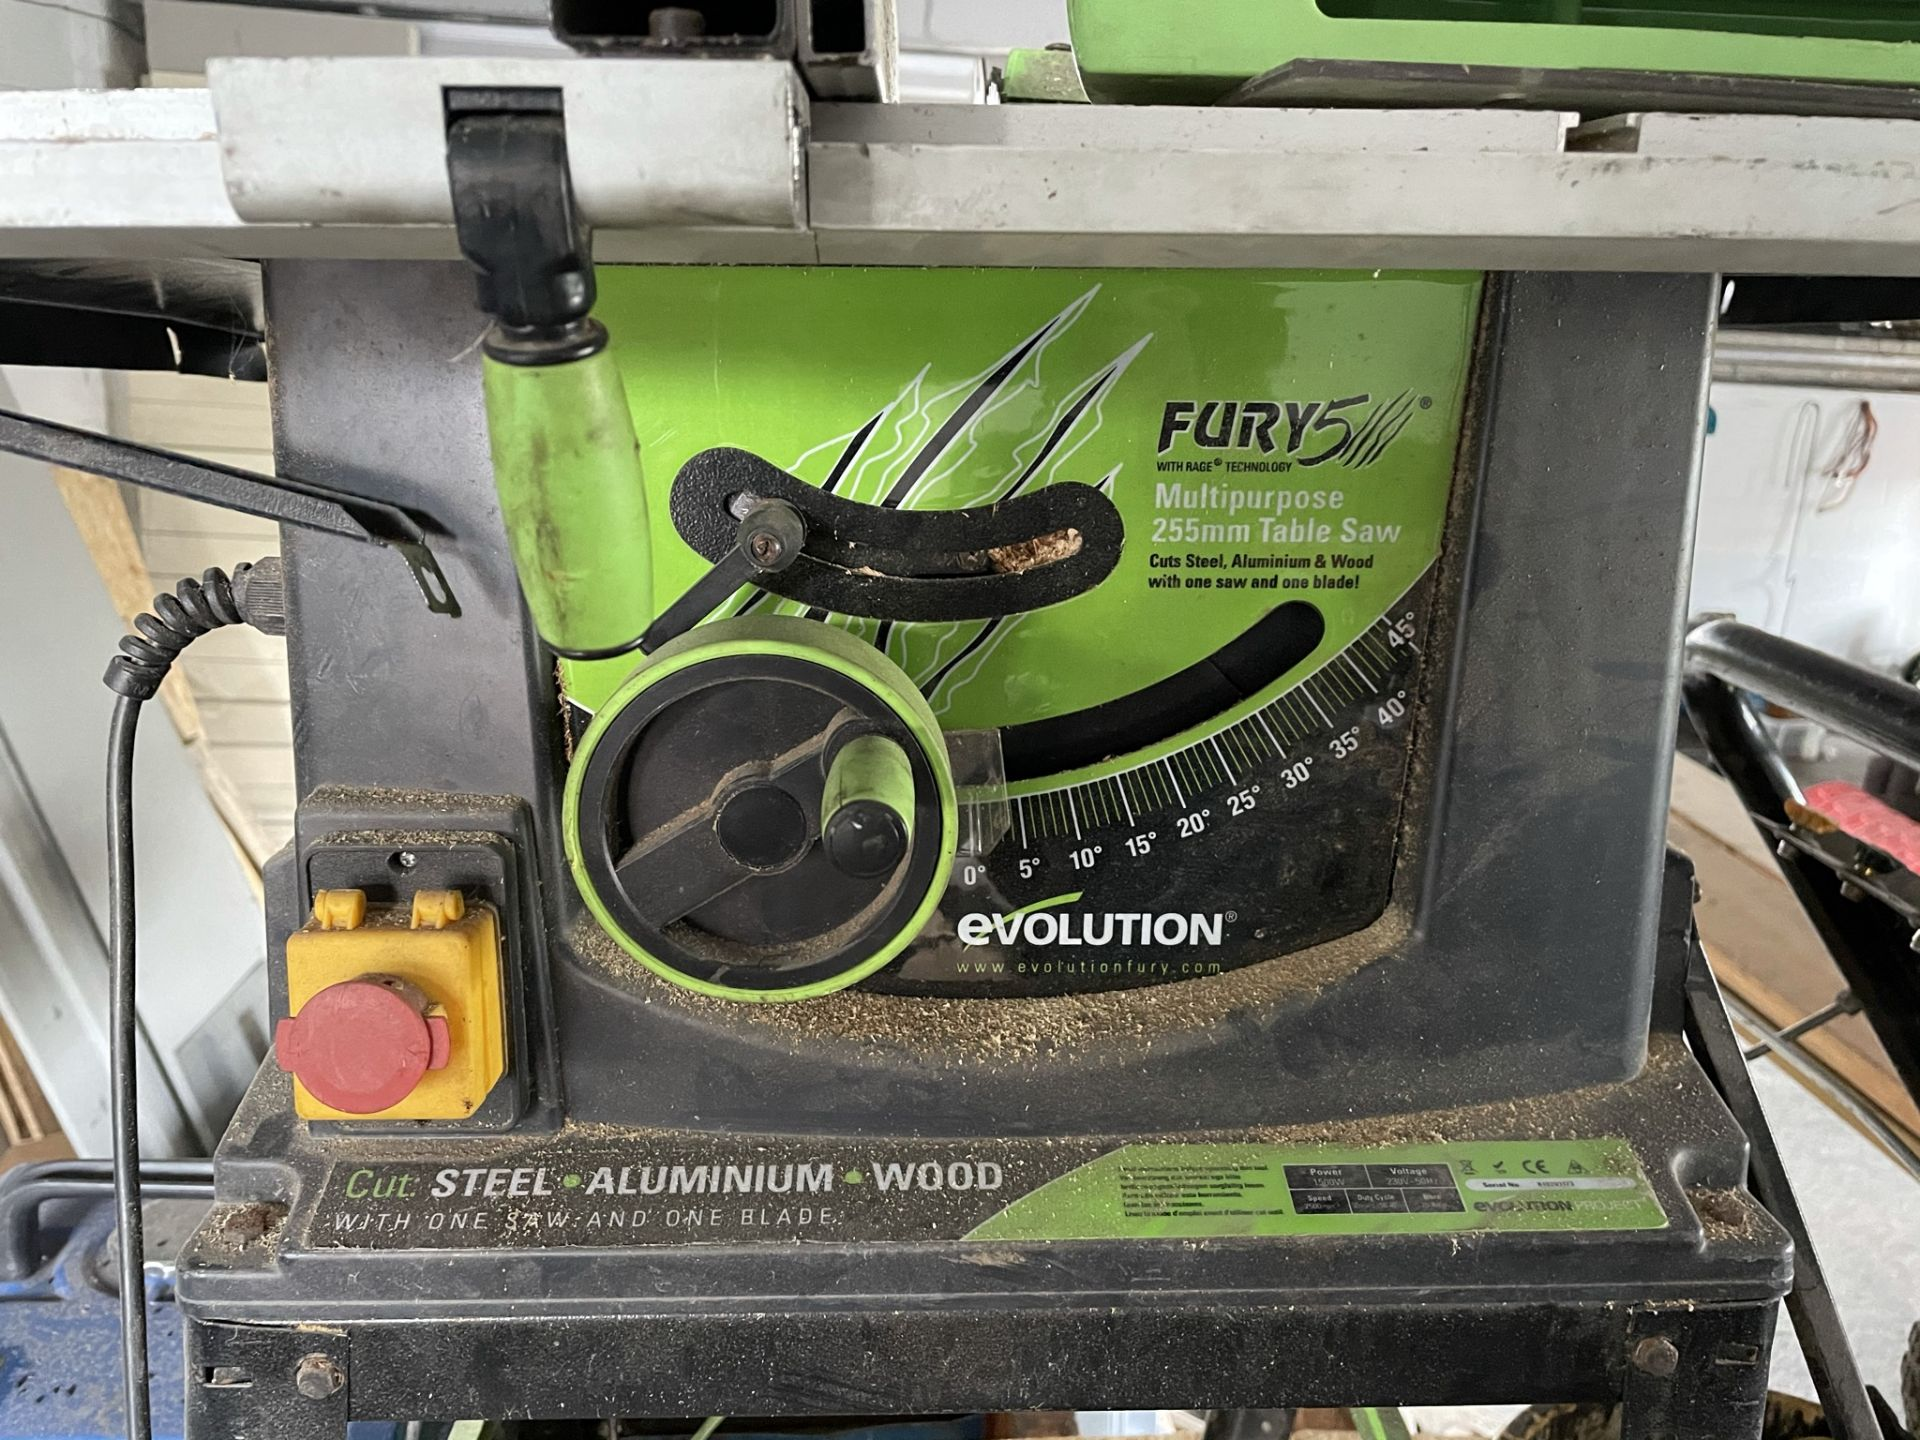 Evolution Fury 5 Multi-Purpose Table Saw - Image 2 of 2